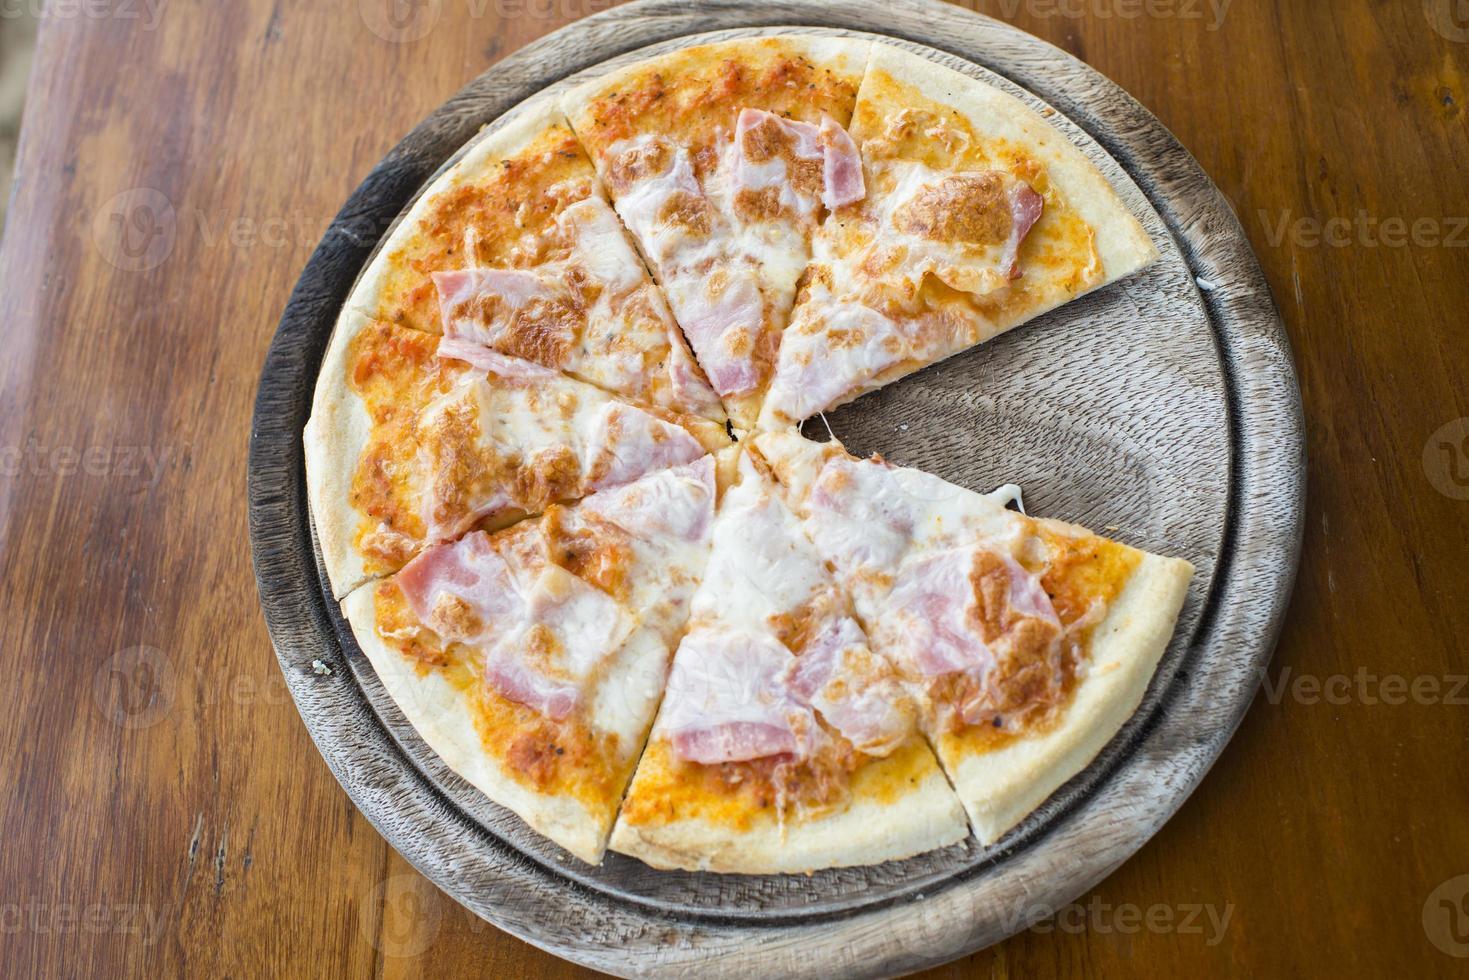 hemlagad pizzaskinka på träbord. foto